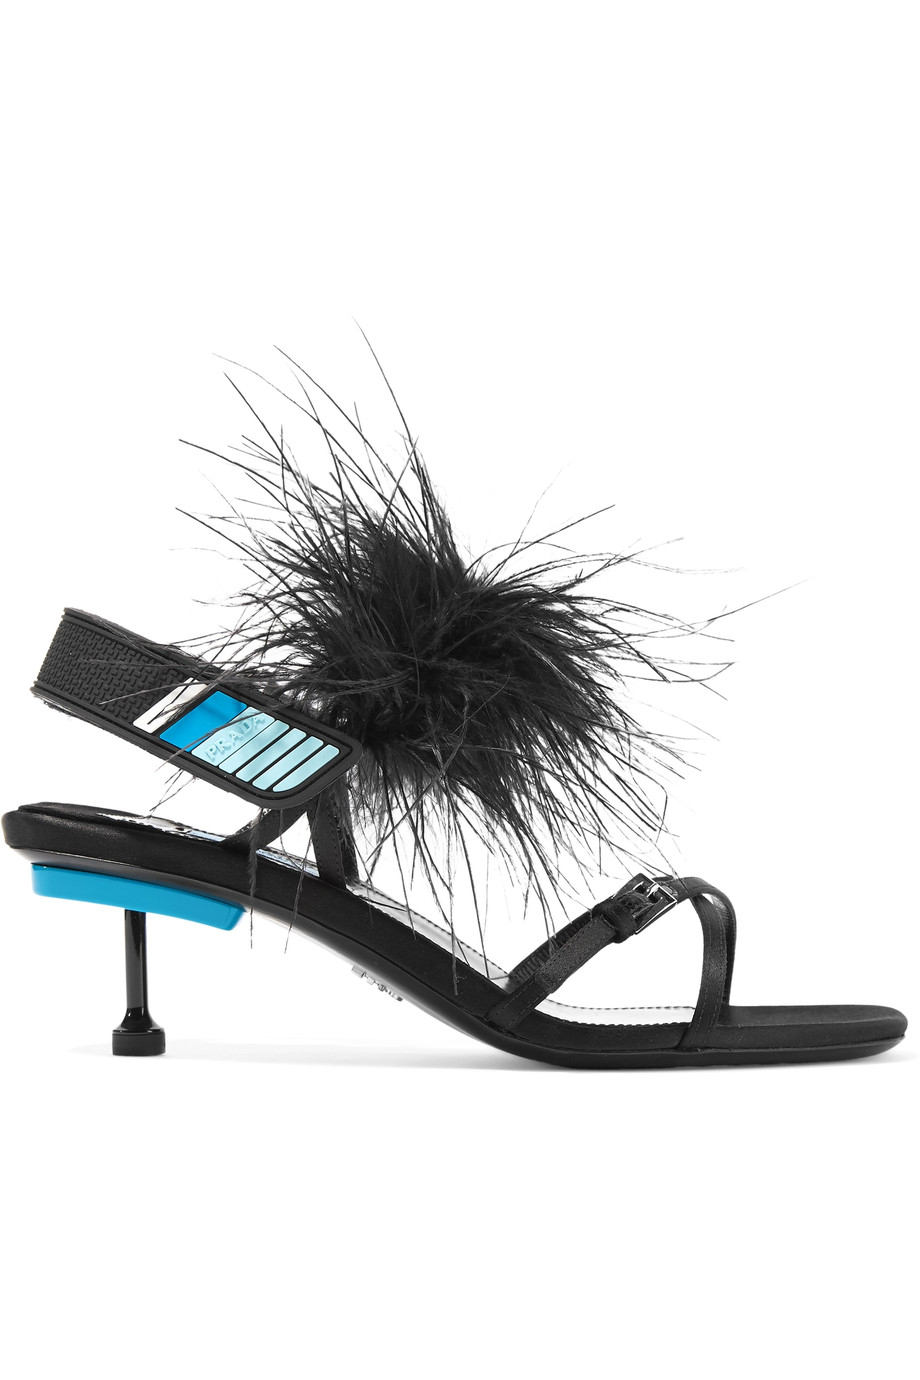 #PopbelaOOTD: Kumpulan Statement Shoes Minggu Ini